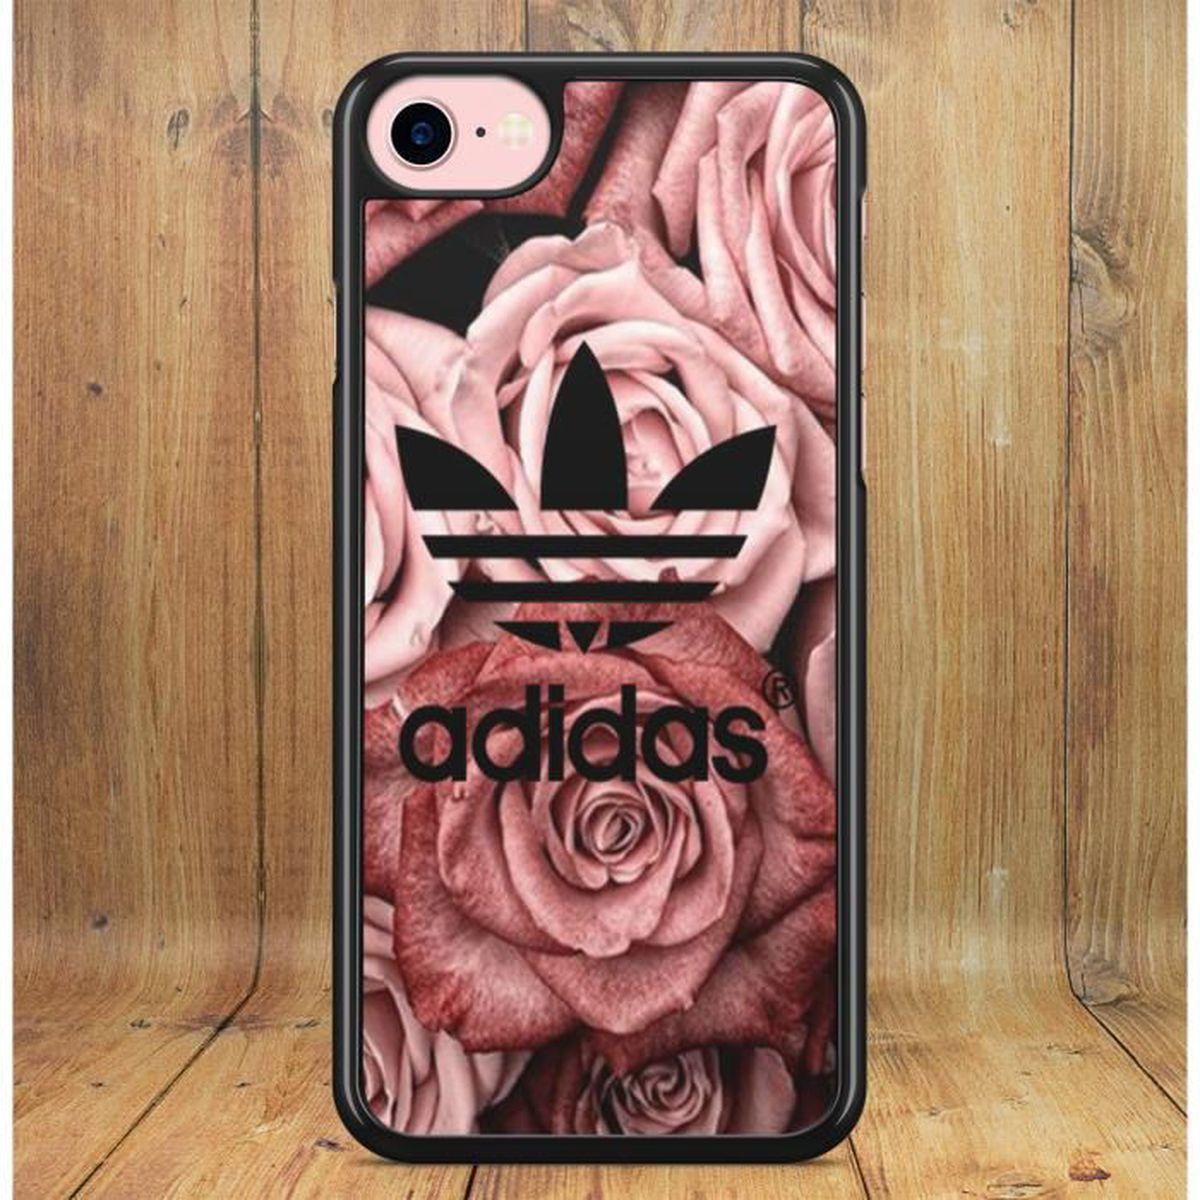 Coque iPhone XS MAX Adidas Roses Fleurs Douceur Romance